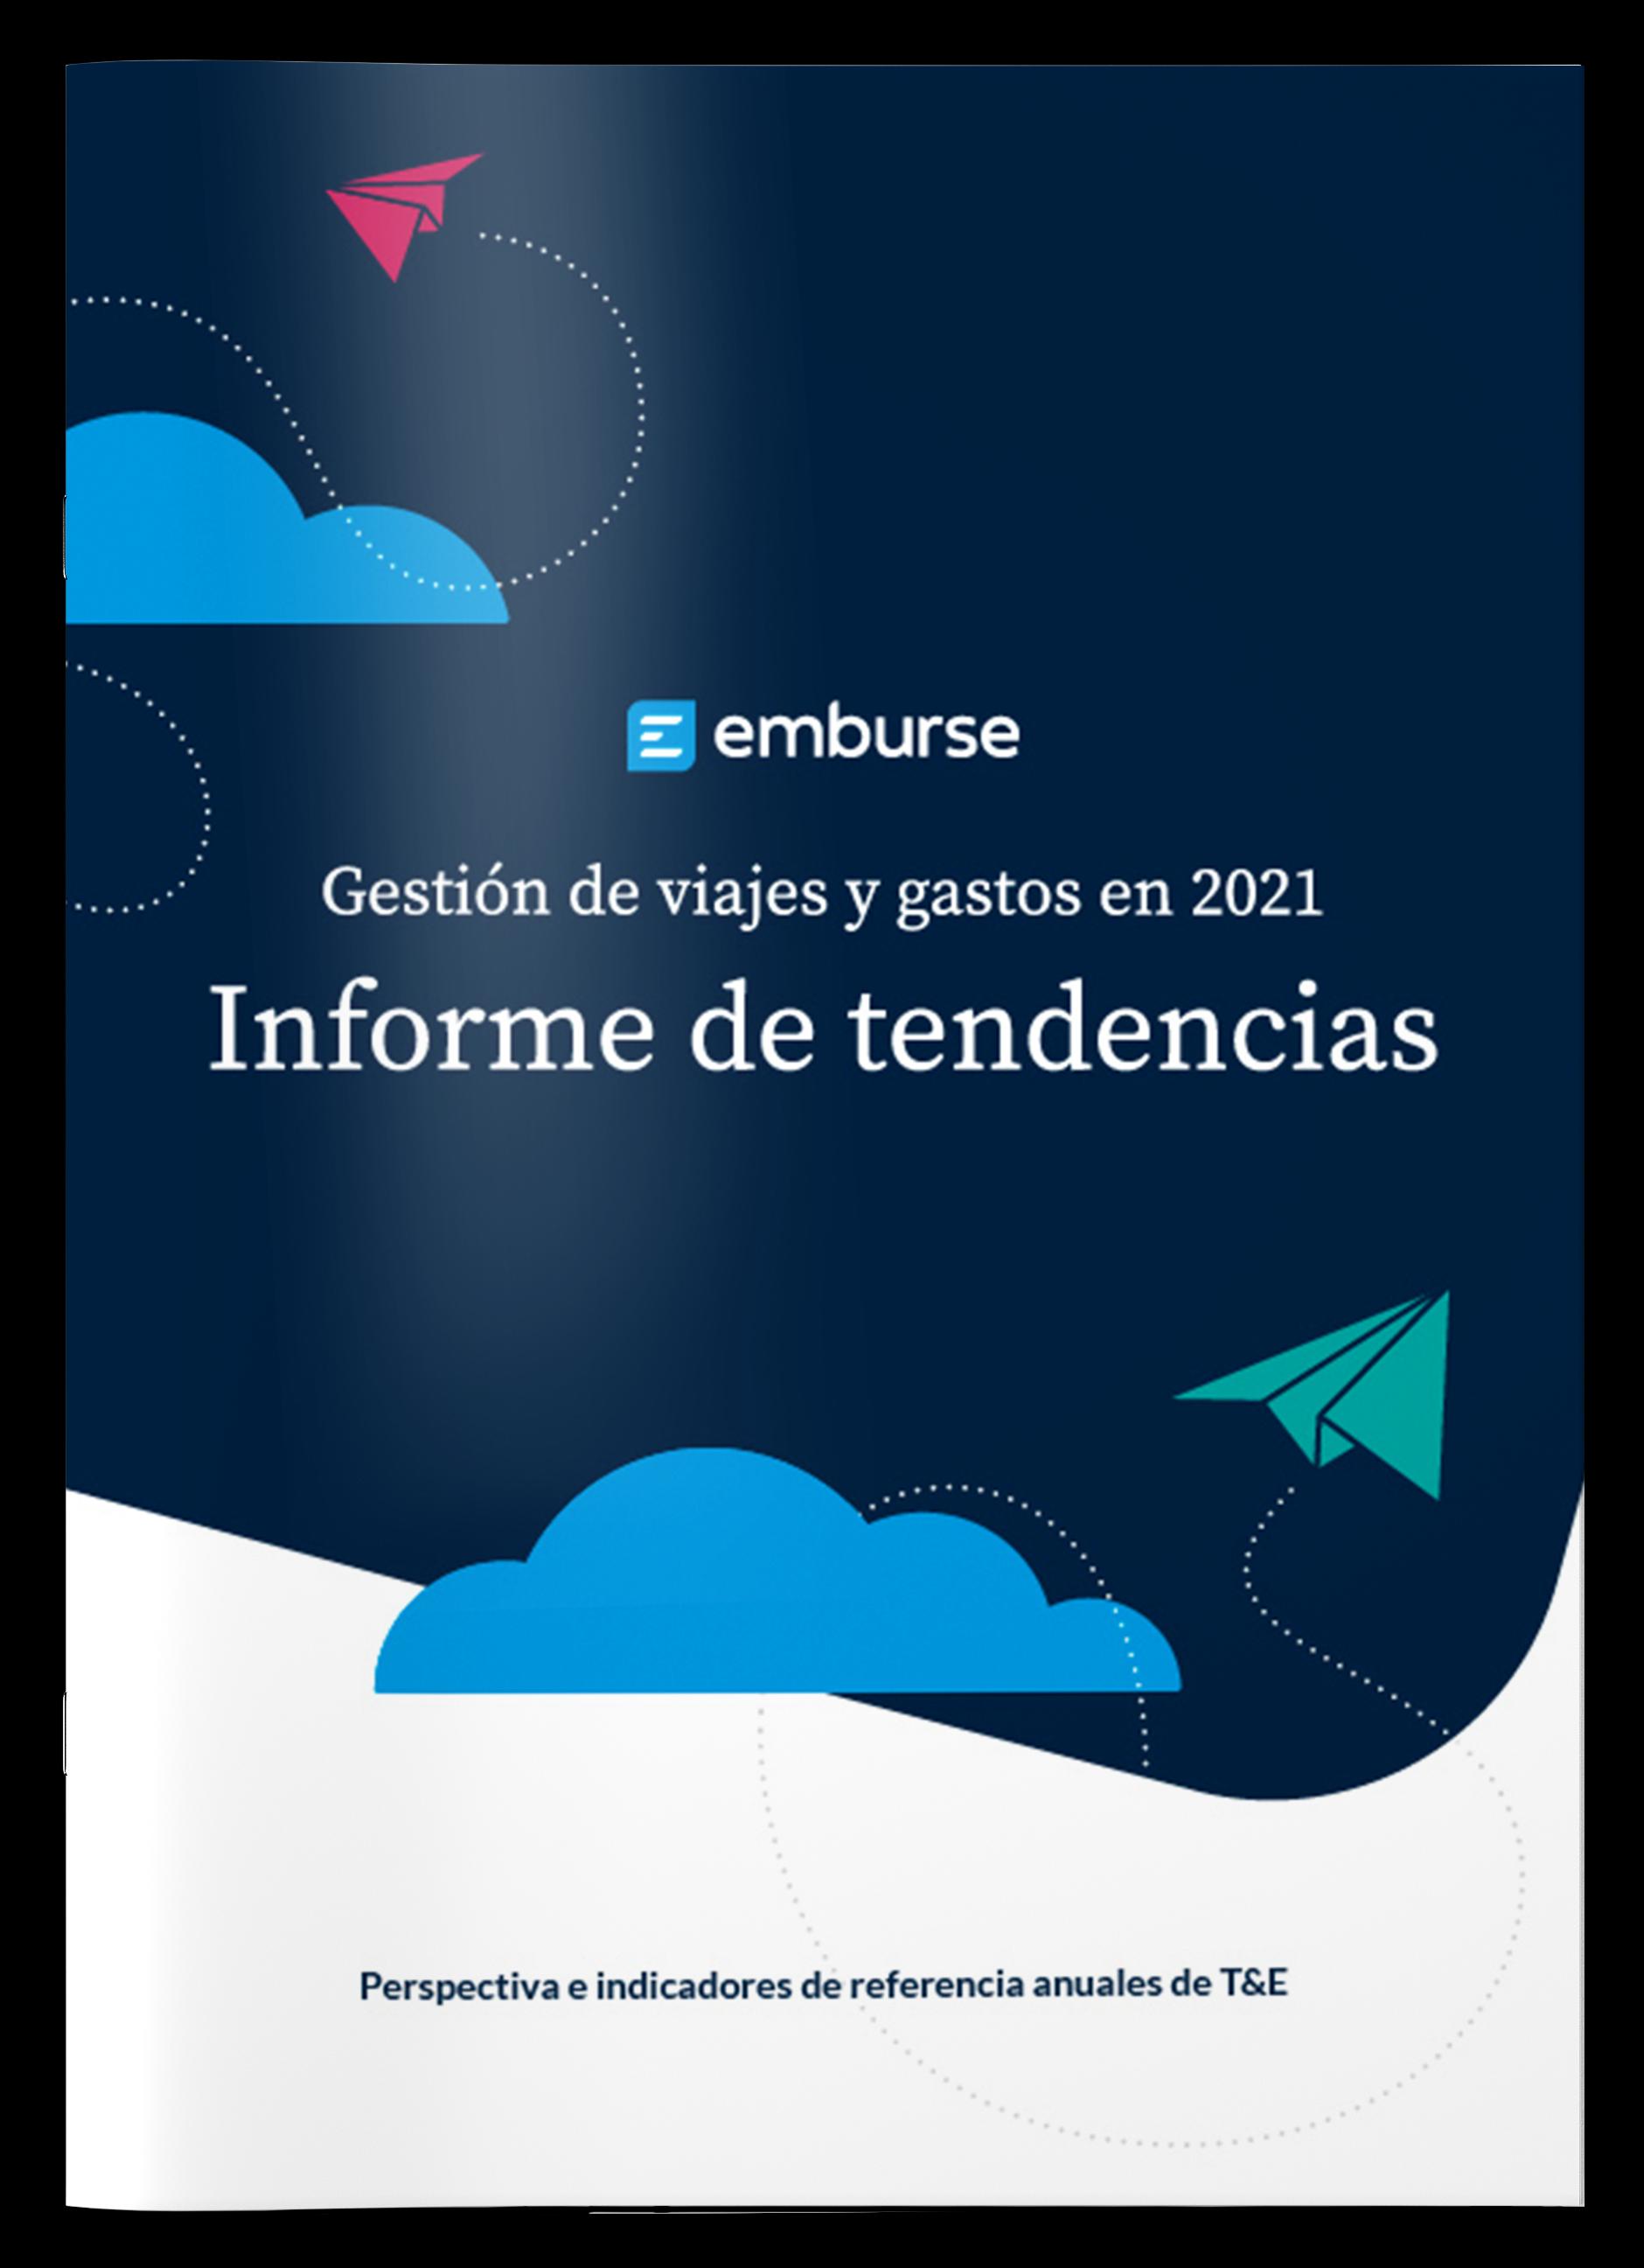 portada 3d informe de tendencias 2021